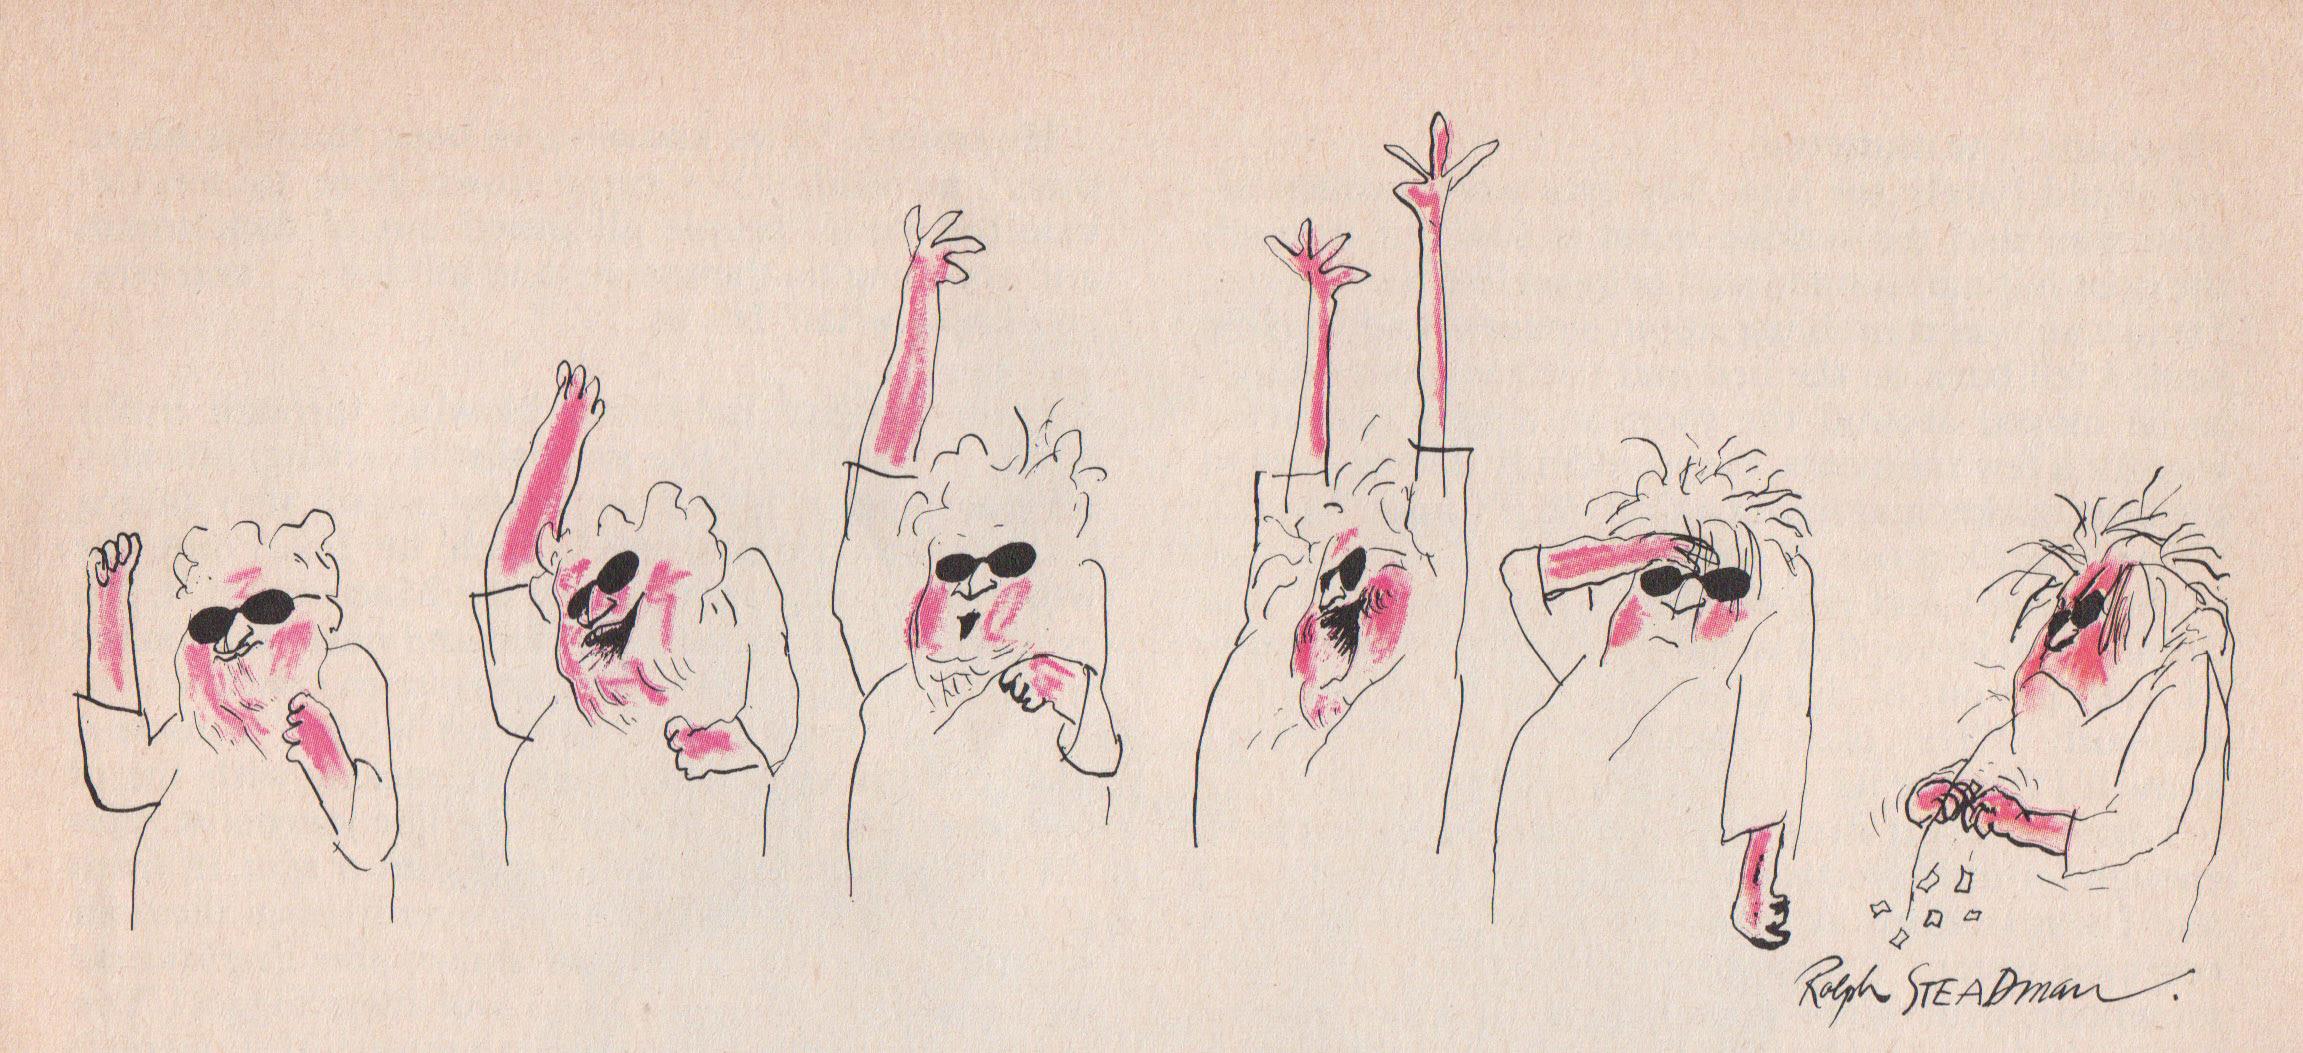 2303x1053 Pin By Carlos Navarro On Illustrations, Drawings And Art